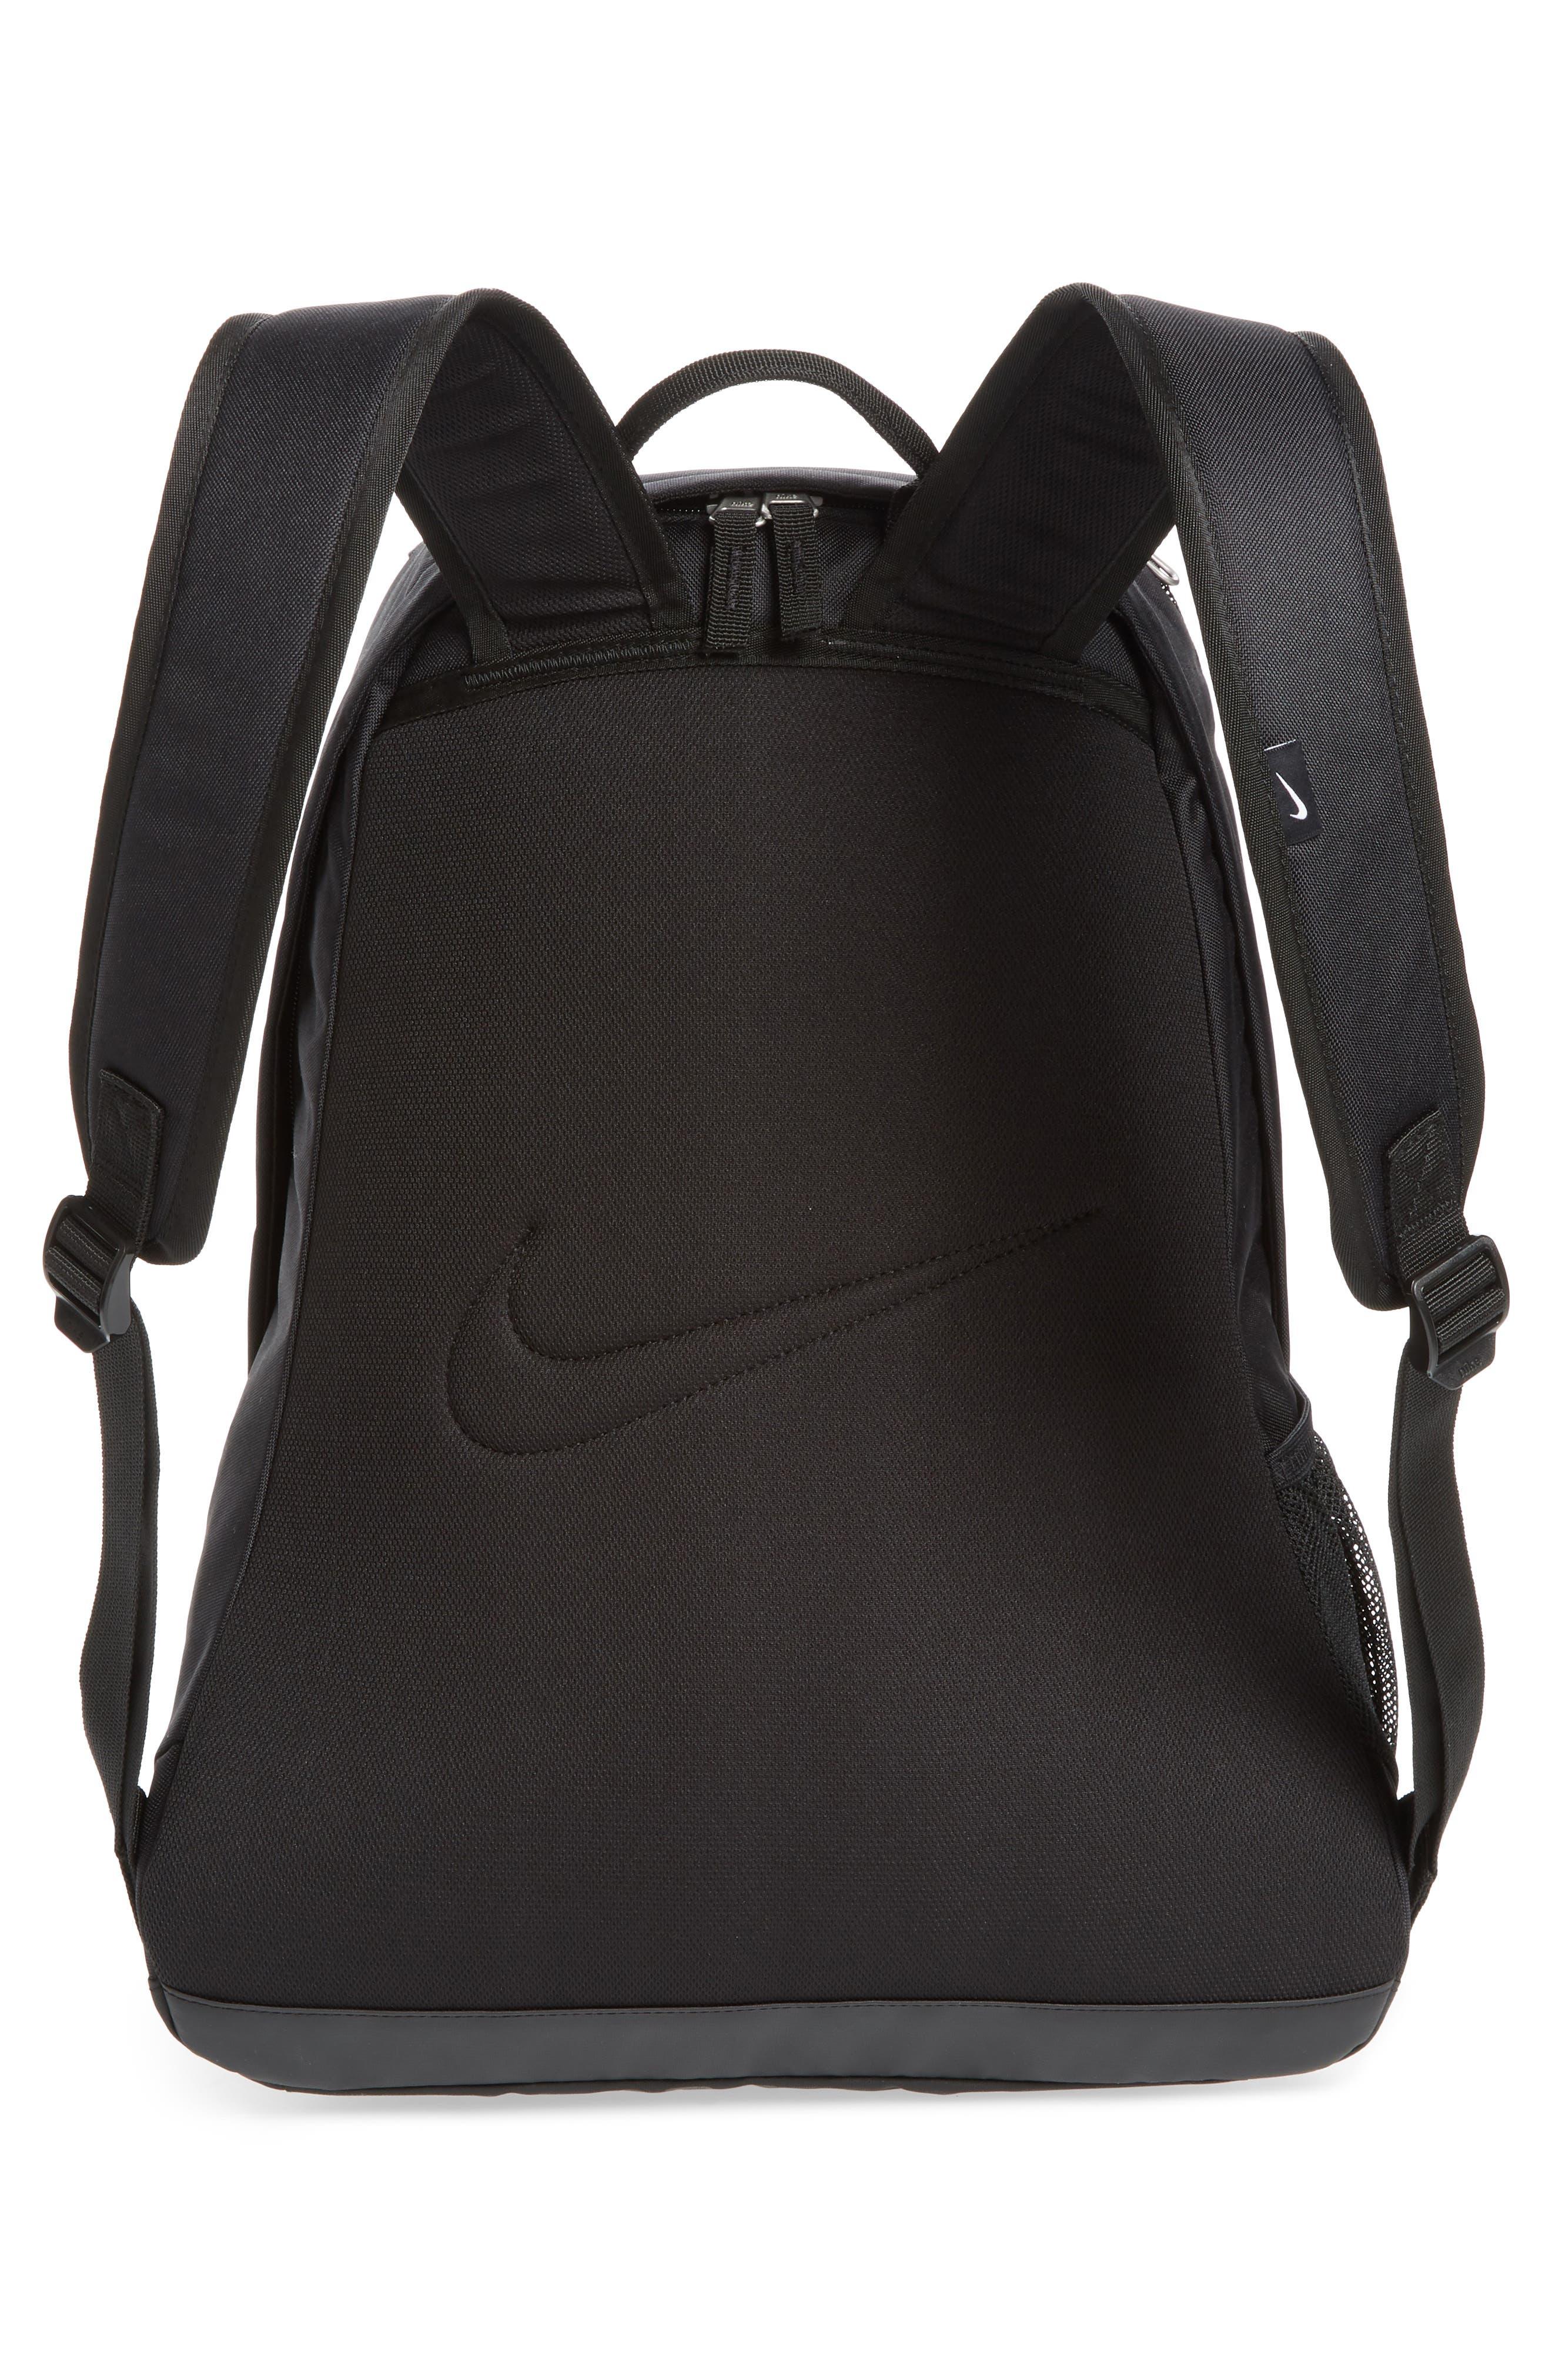 Club Team Backpack,                             Alternate thumbnail 3, color,                             Black/ Black/ White